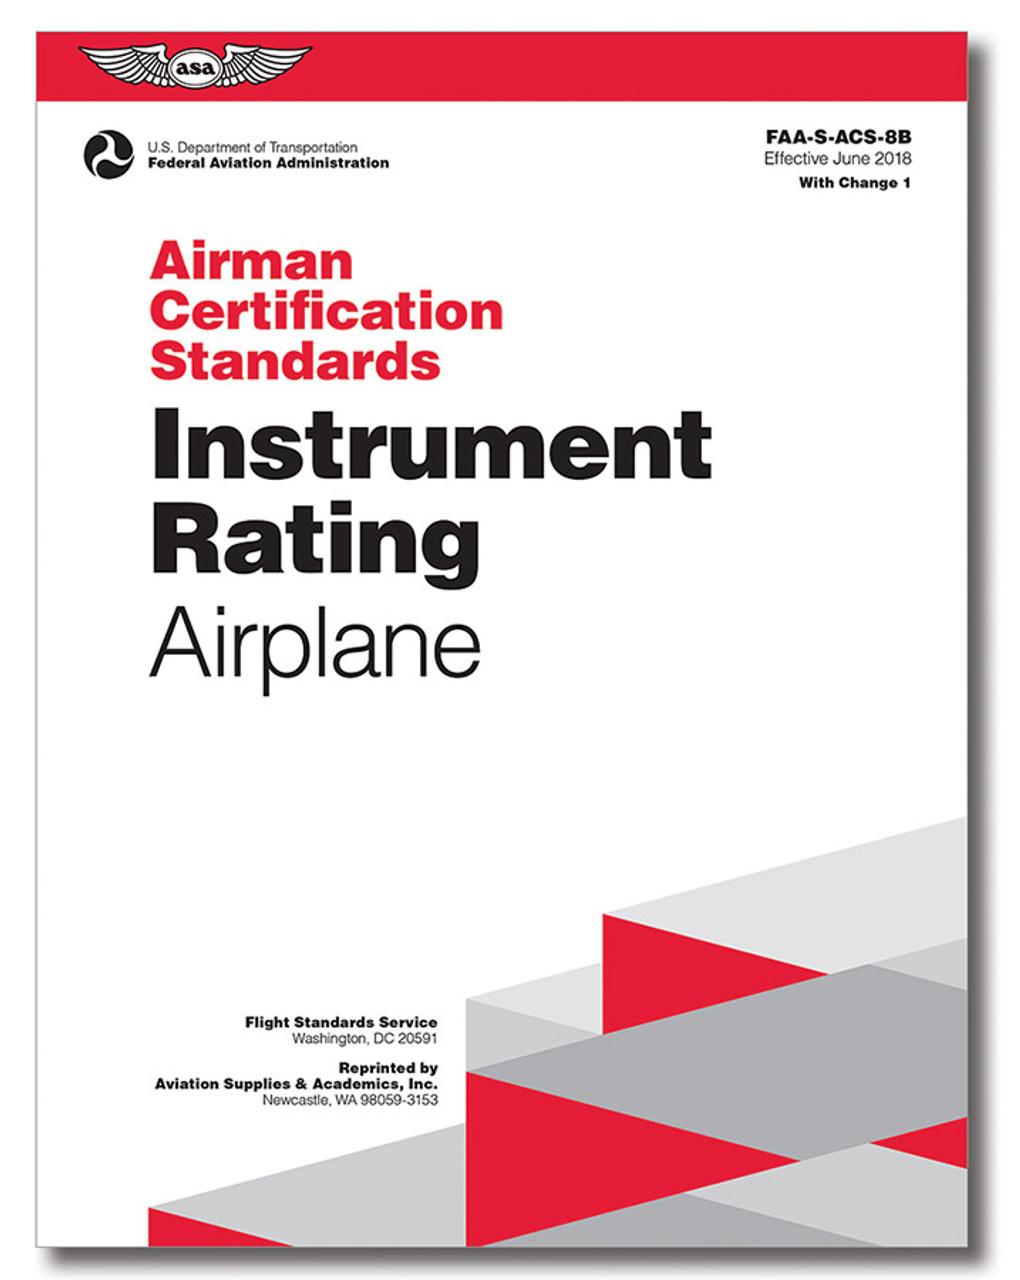 ASA Airman Certification Standards: Instrument Rating (Airplane) 8B.1